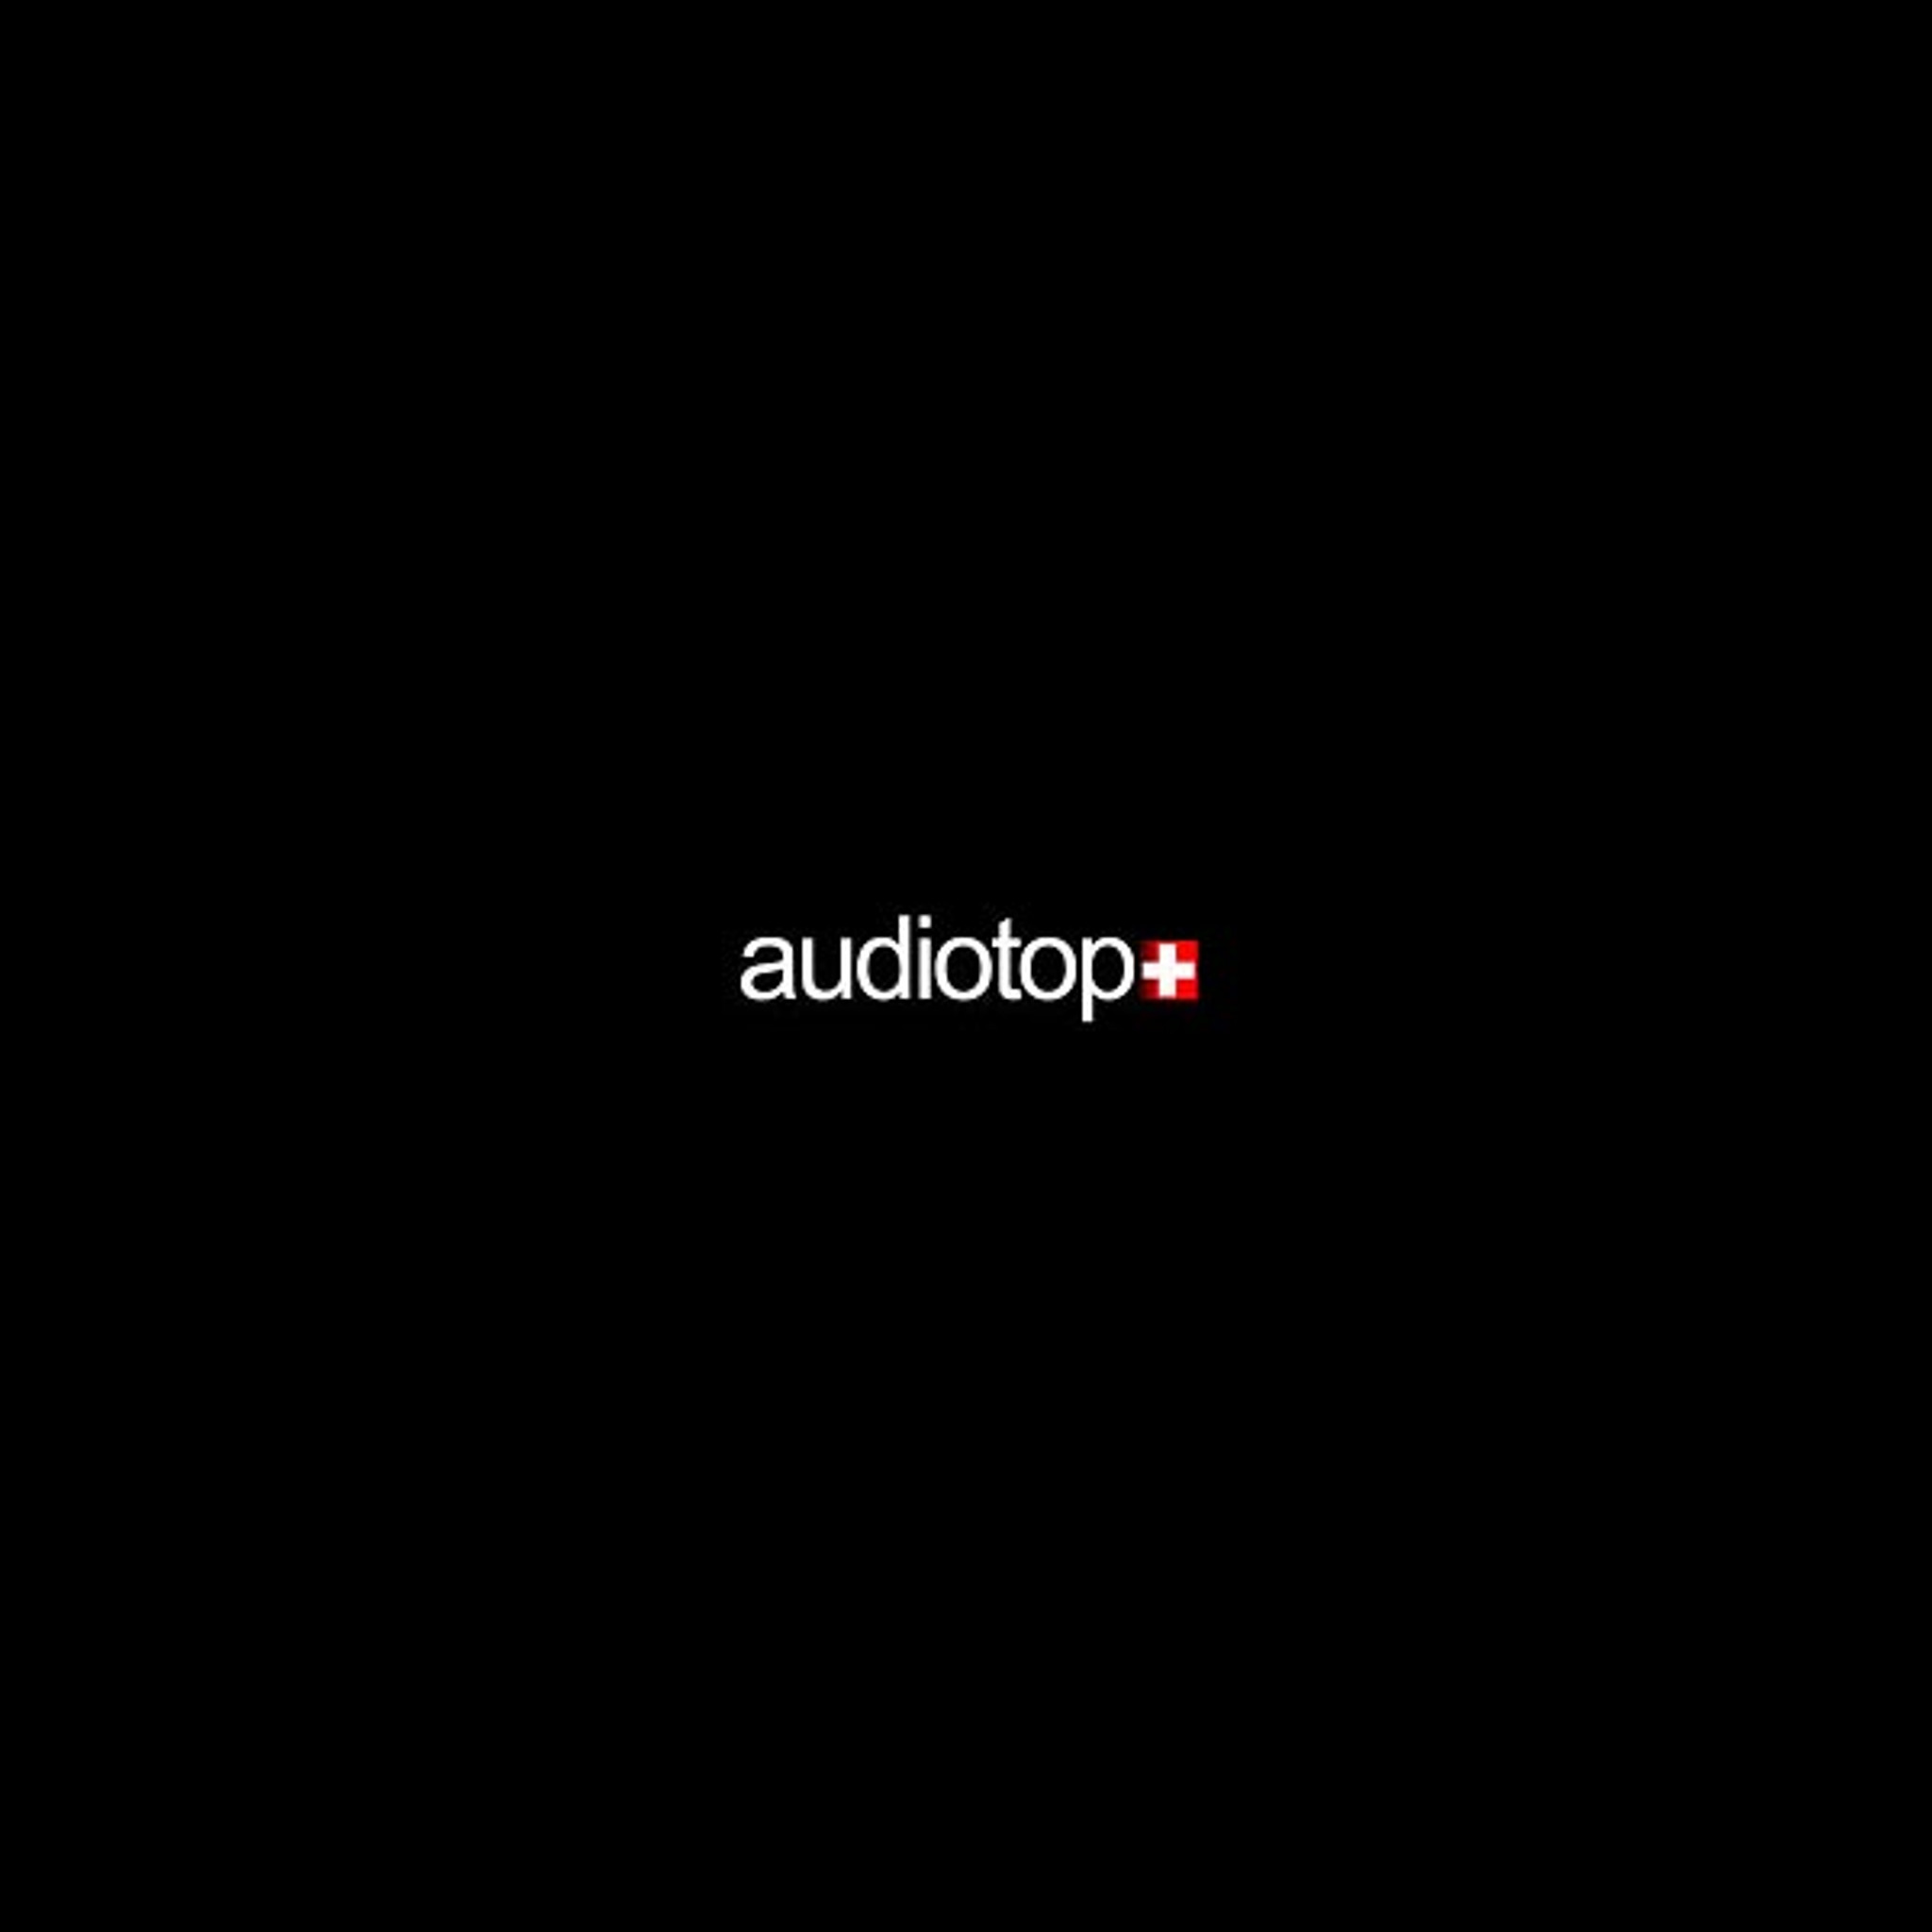 Audiotop